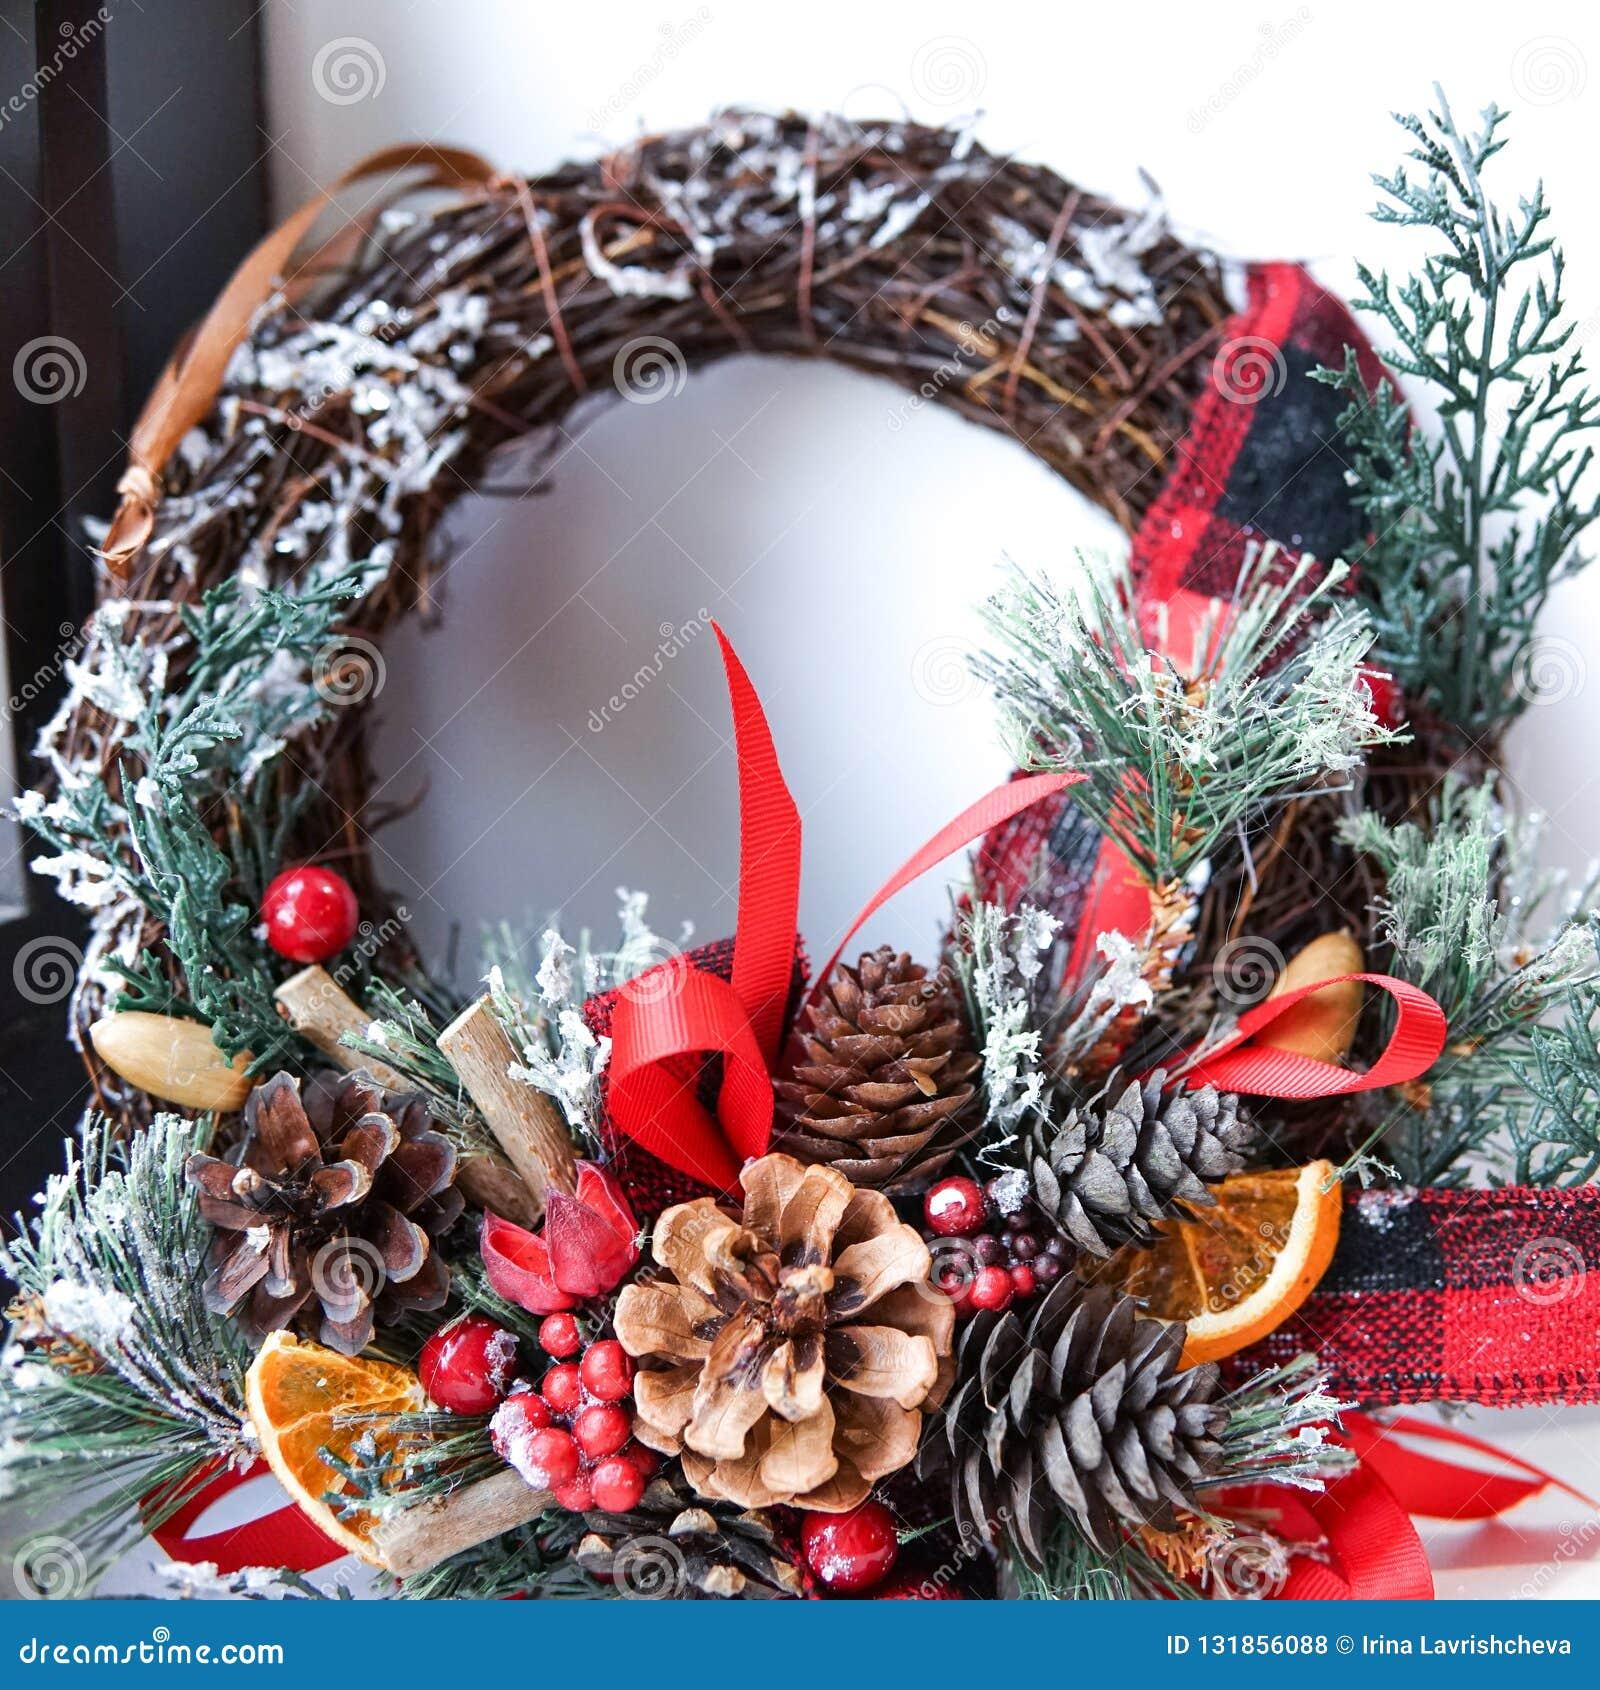 Creative Christmas Wreath An Unusual Idea For A Holiday Home De Stock Photo Image Of Handmade Green 131856088